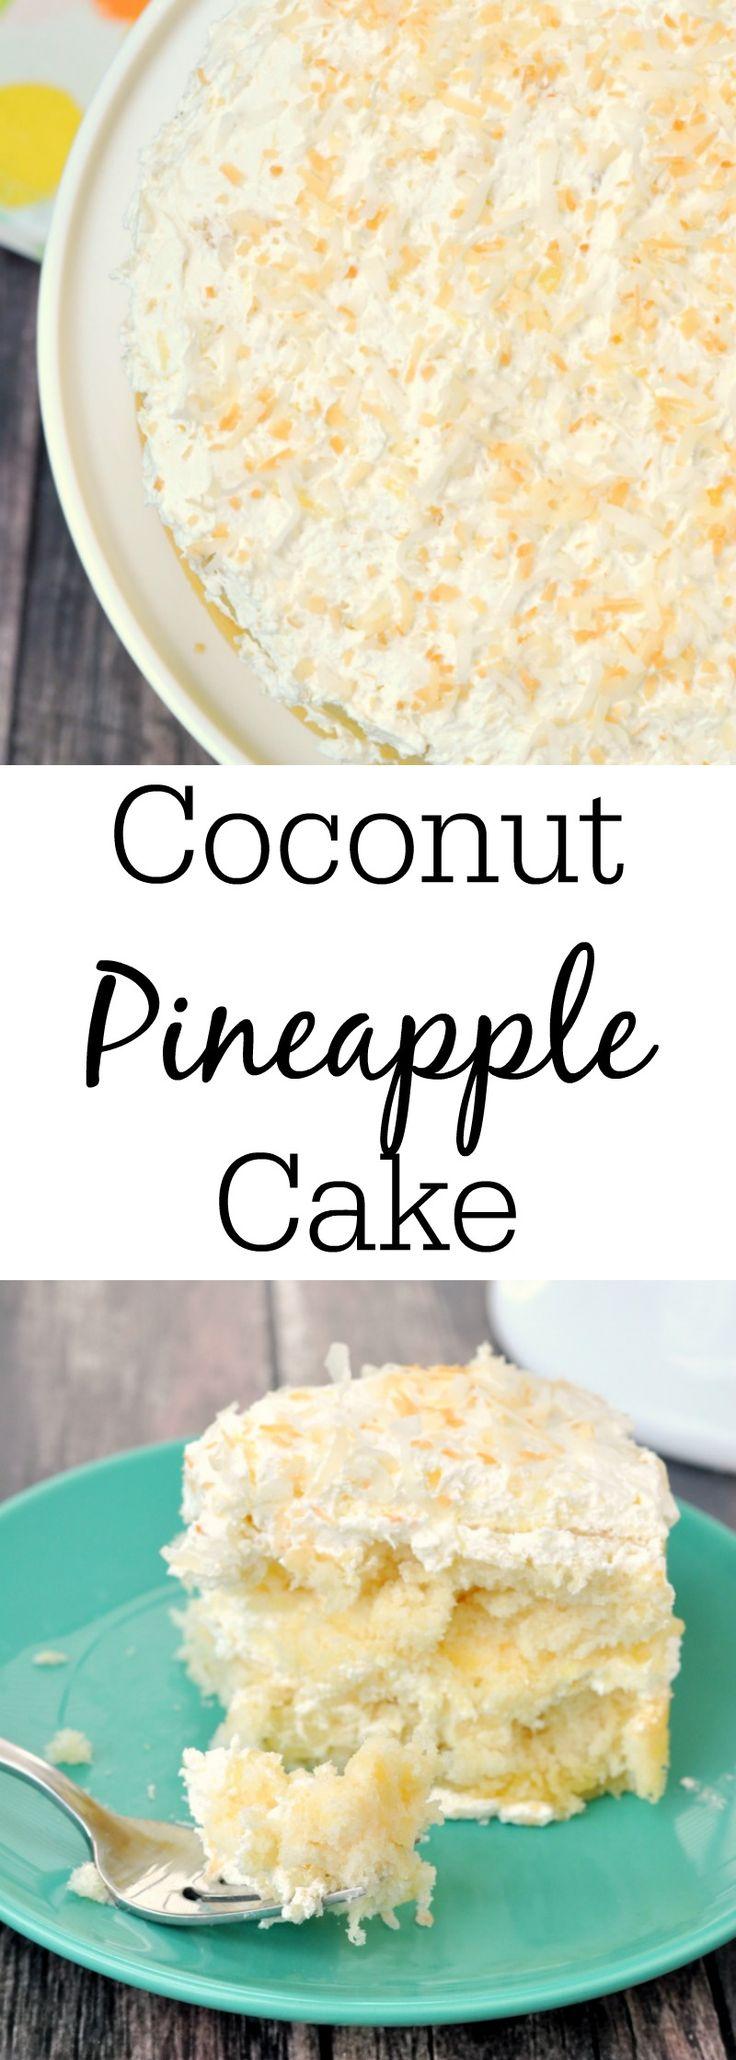 Grandma's Famous Coconut Pineapple Cake | #InspirationSpotlight